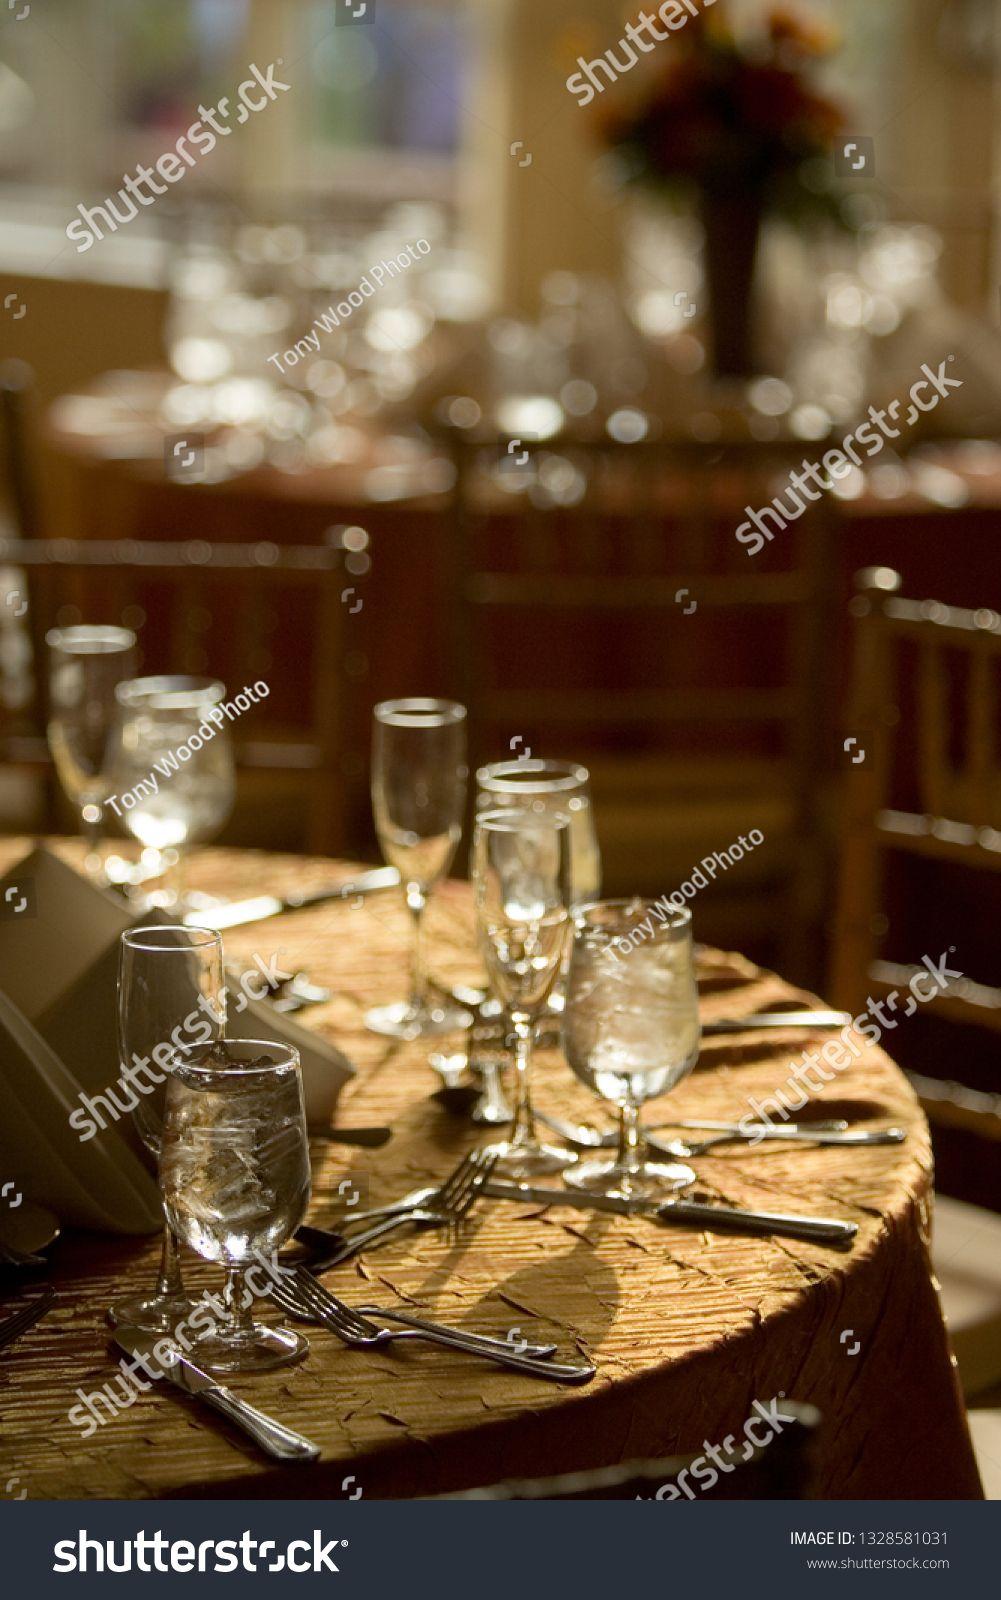 Celebration Table Setting Half Round Table Ad Affiliate Celebration Table Setting In 2020 Half Round Table Table Settings Table Decorations